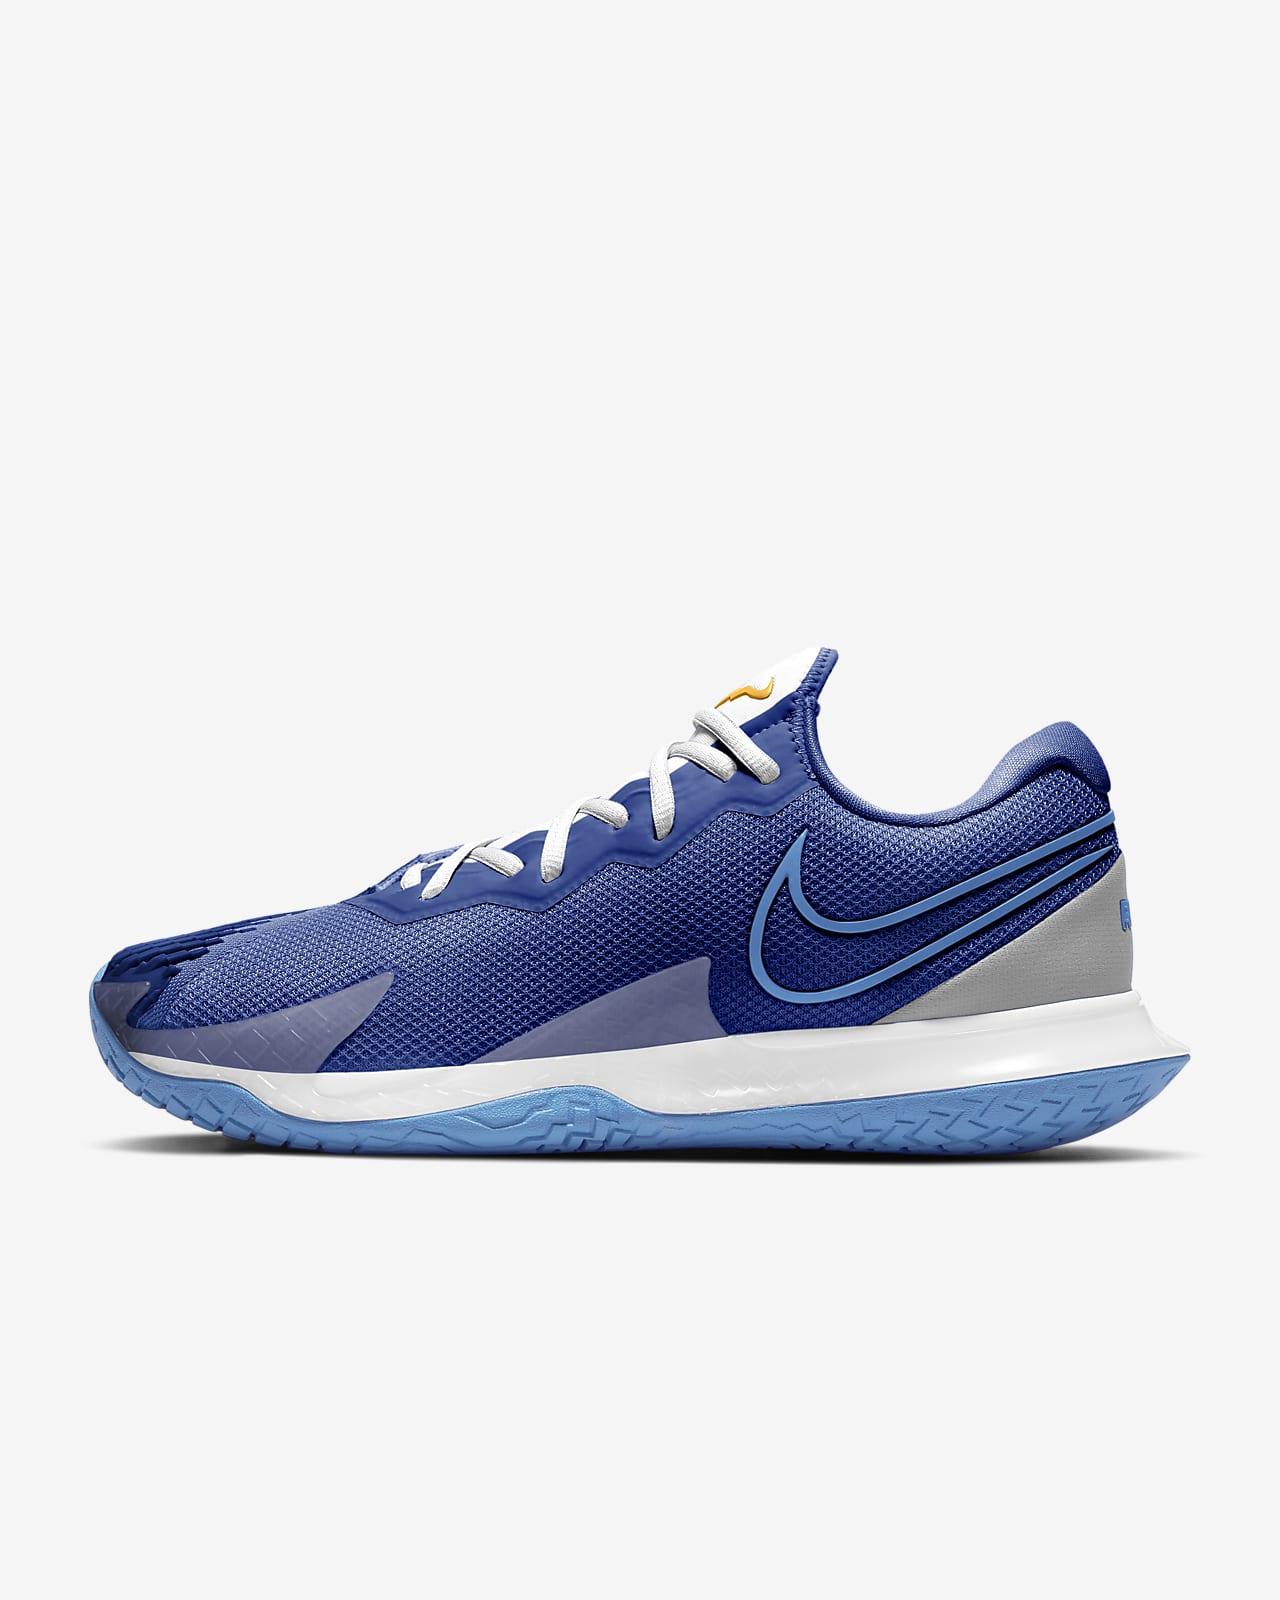 NikeCourt Air Zoom Vapor Cage 4 Sabatilles per a pista ràpida de tennis - Home